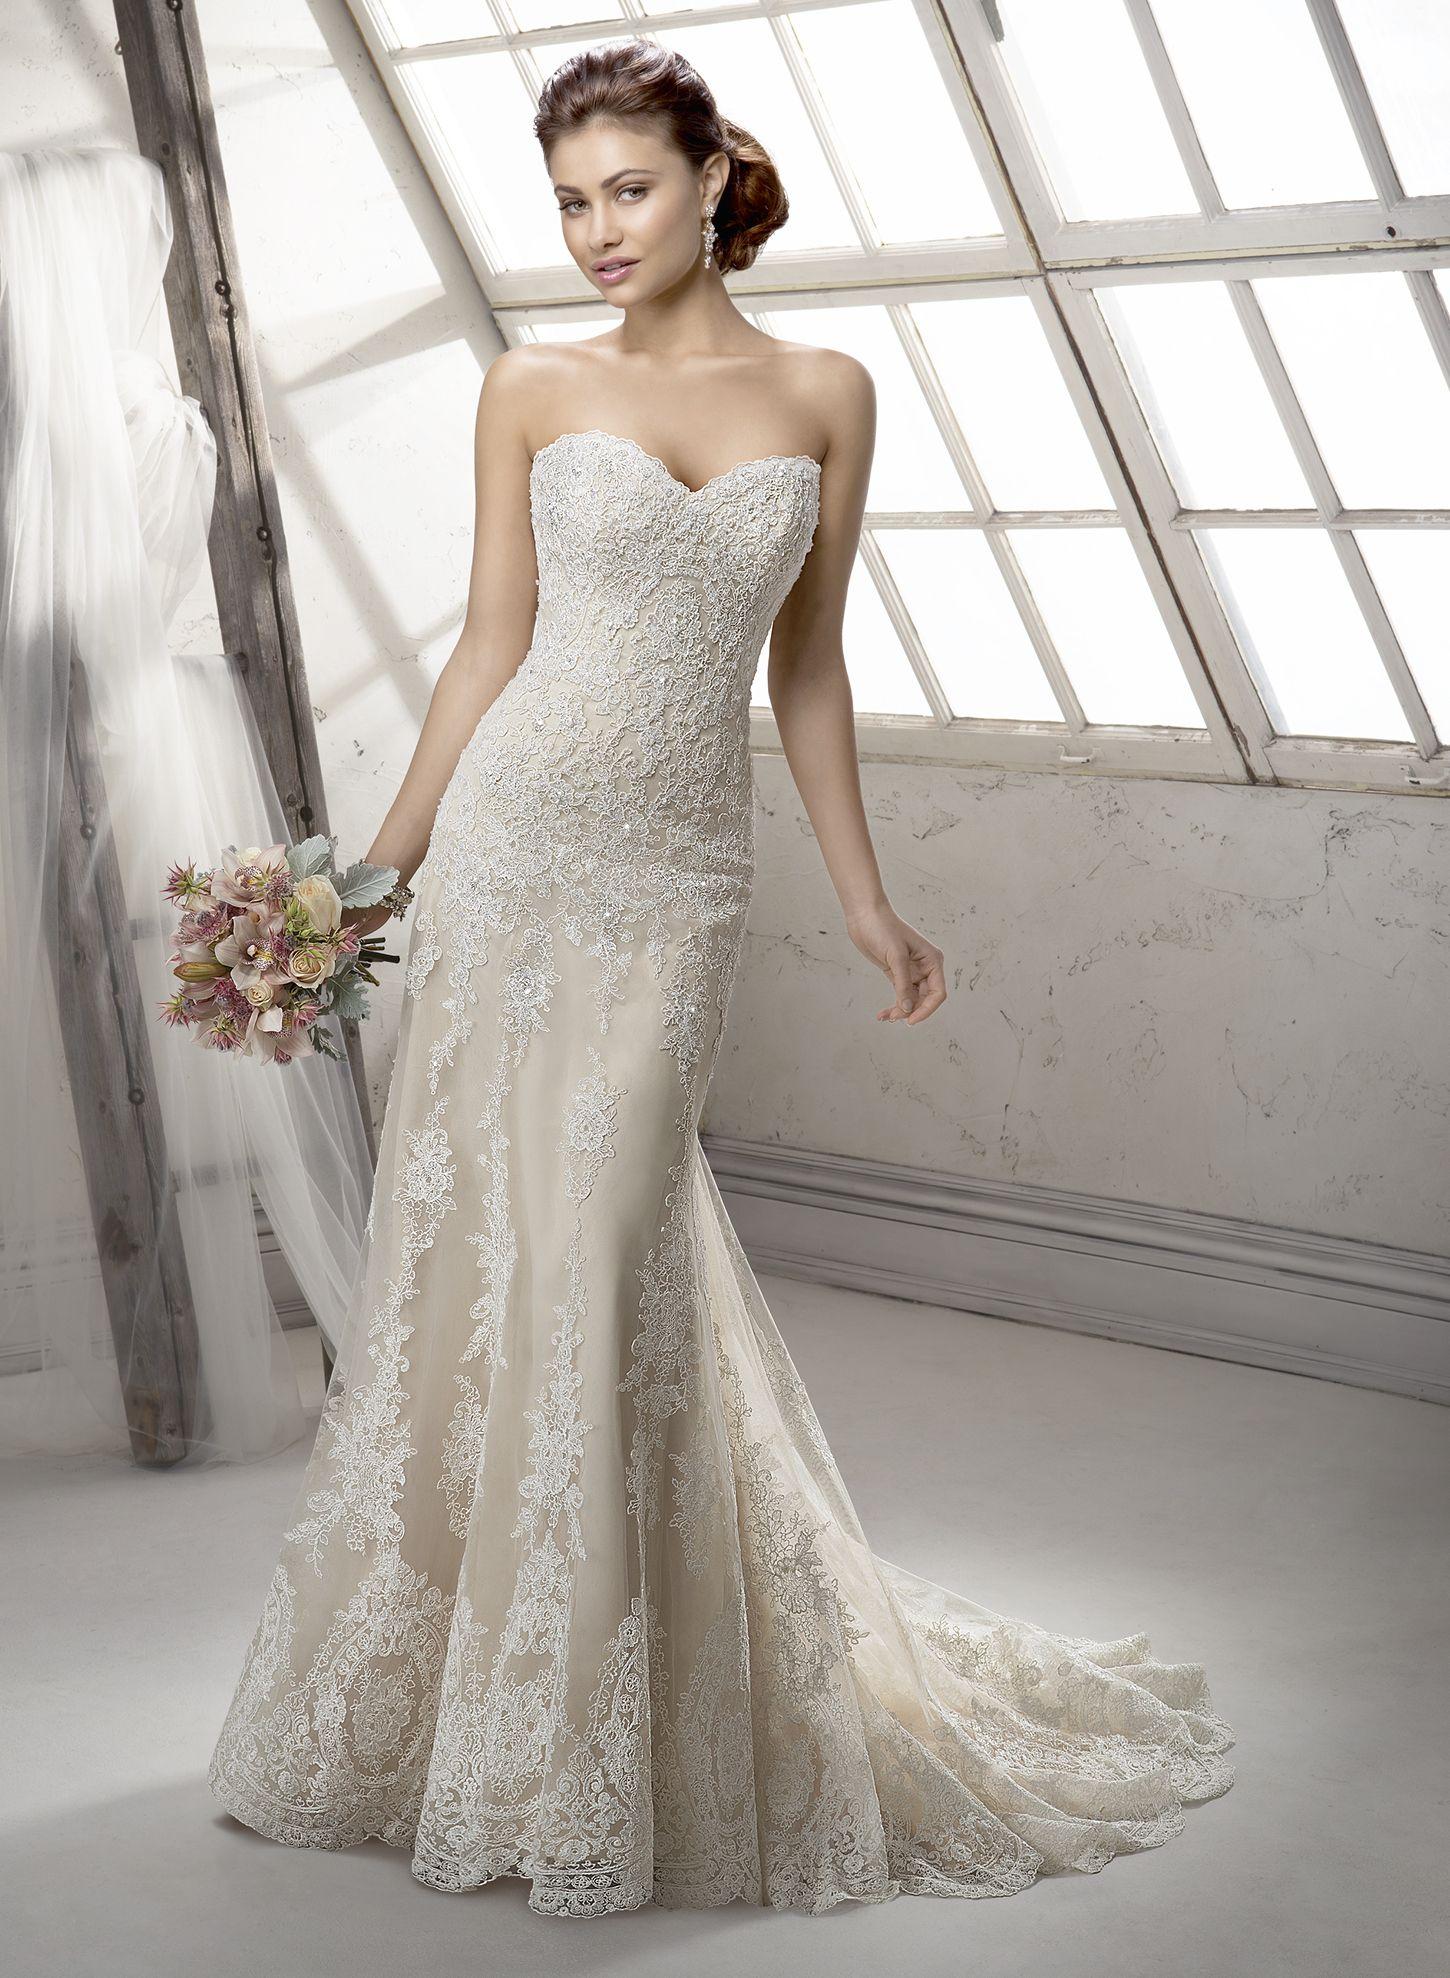 Maggie Sottero Wedding Dresses   Maggie sottero, Sottero midgley and ...